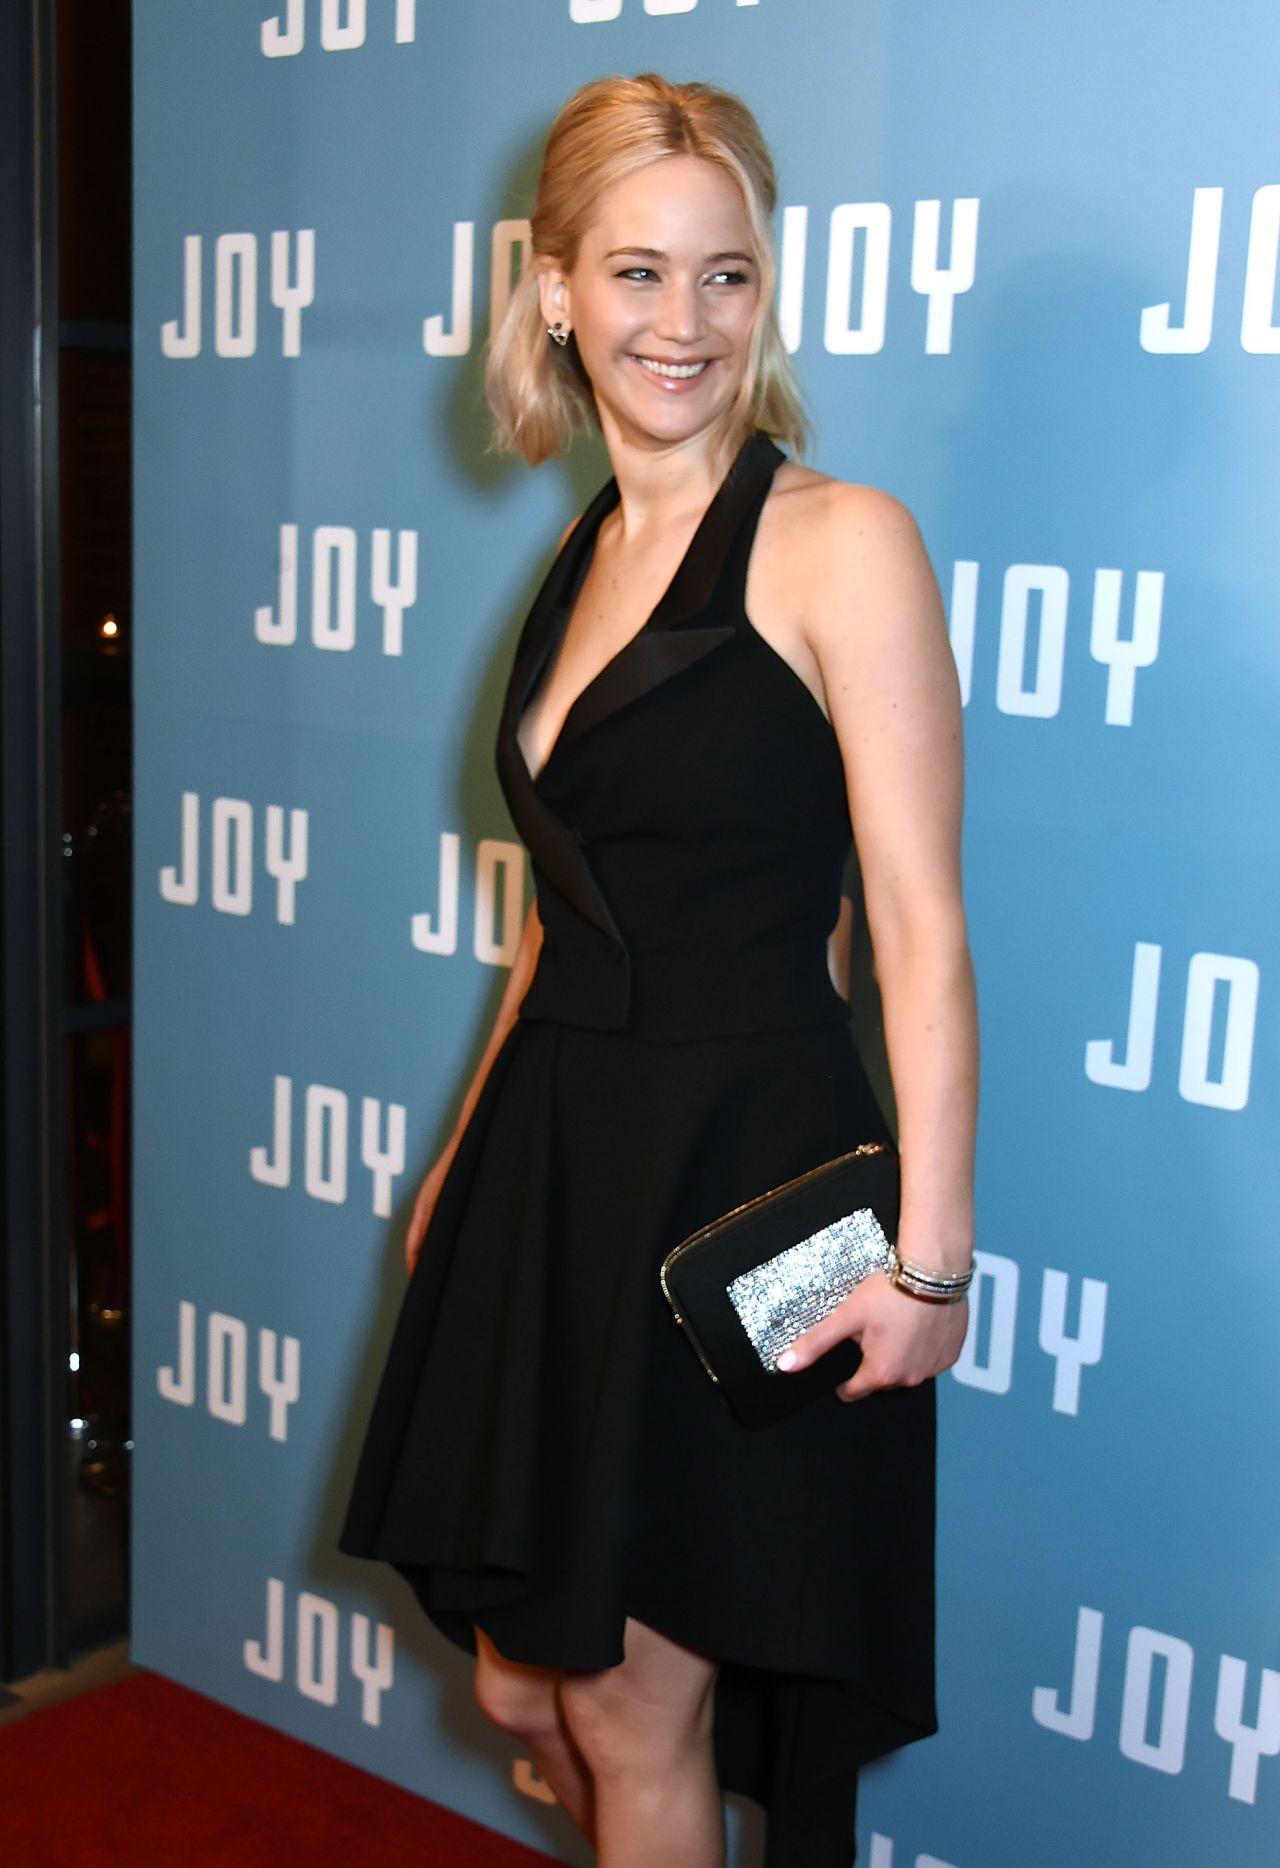 jennifer-lawrence-joy-screening-at-ham-yard-hotel-in-london_7